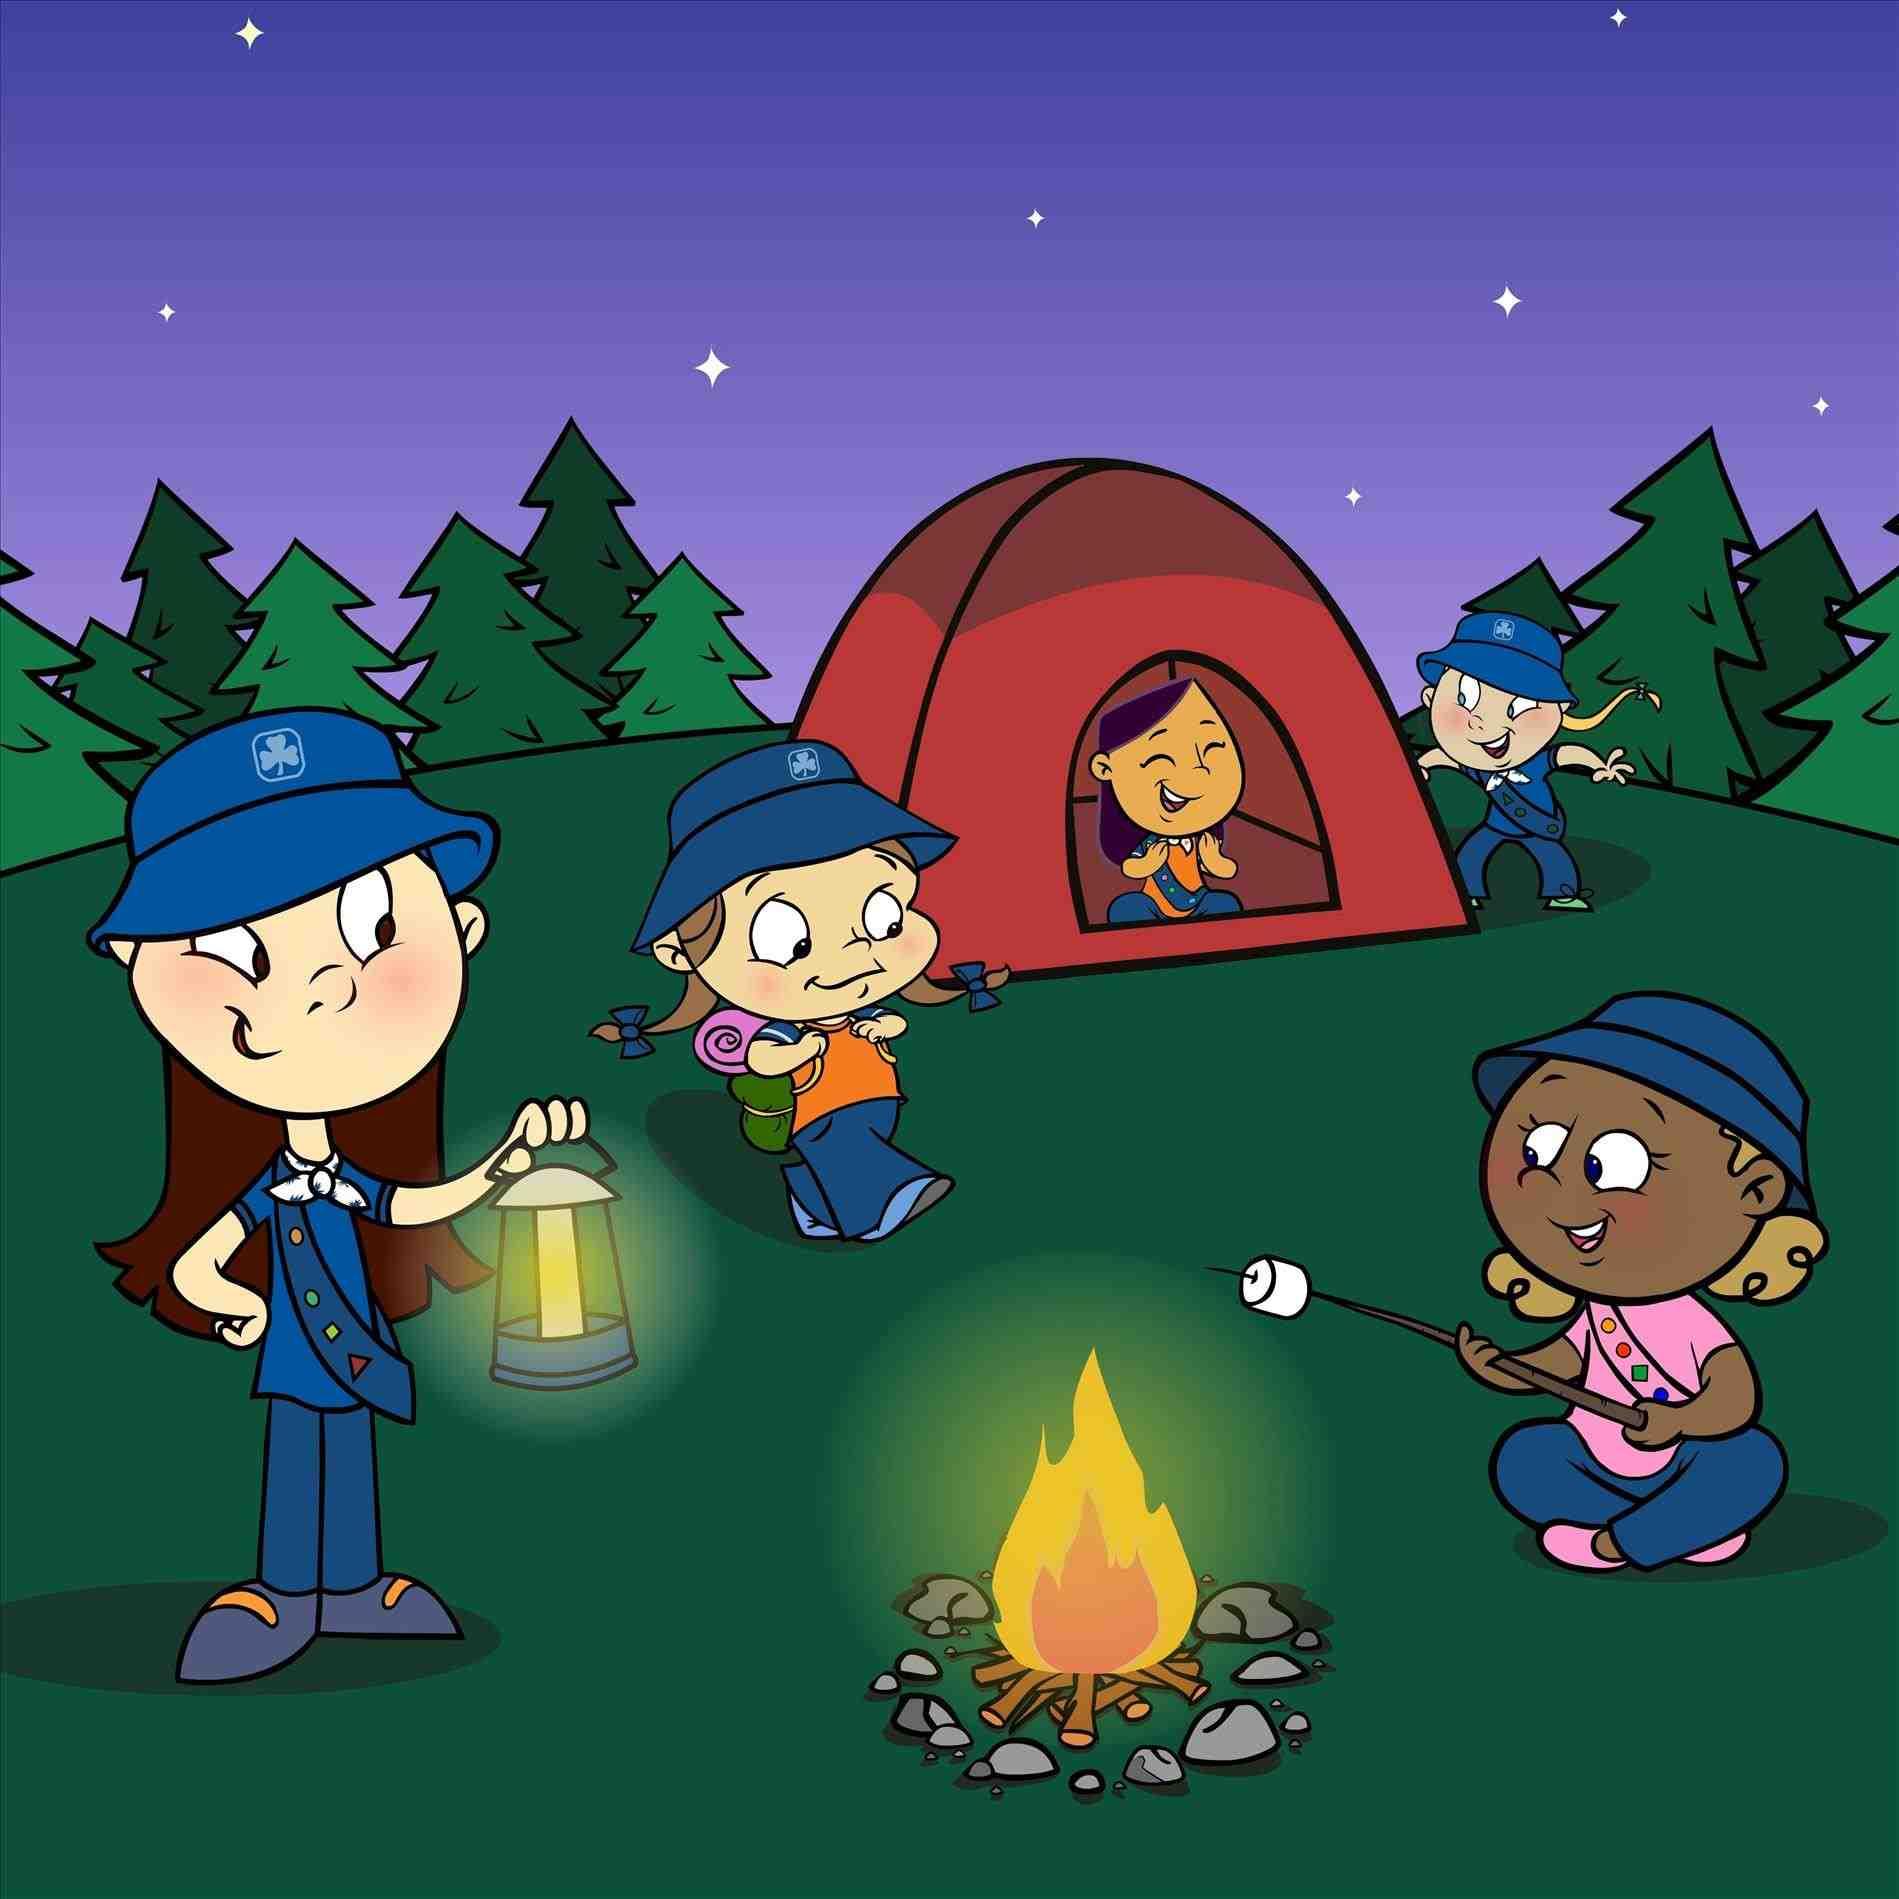 Camping clipart backyard camping. Alltripgo camp outrhetsycom girls